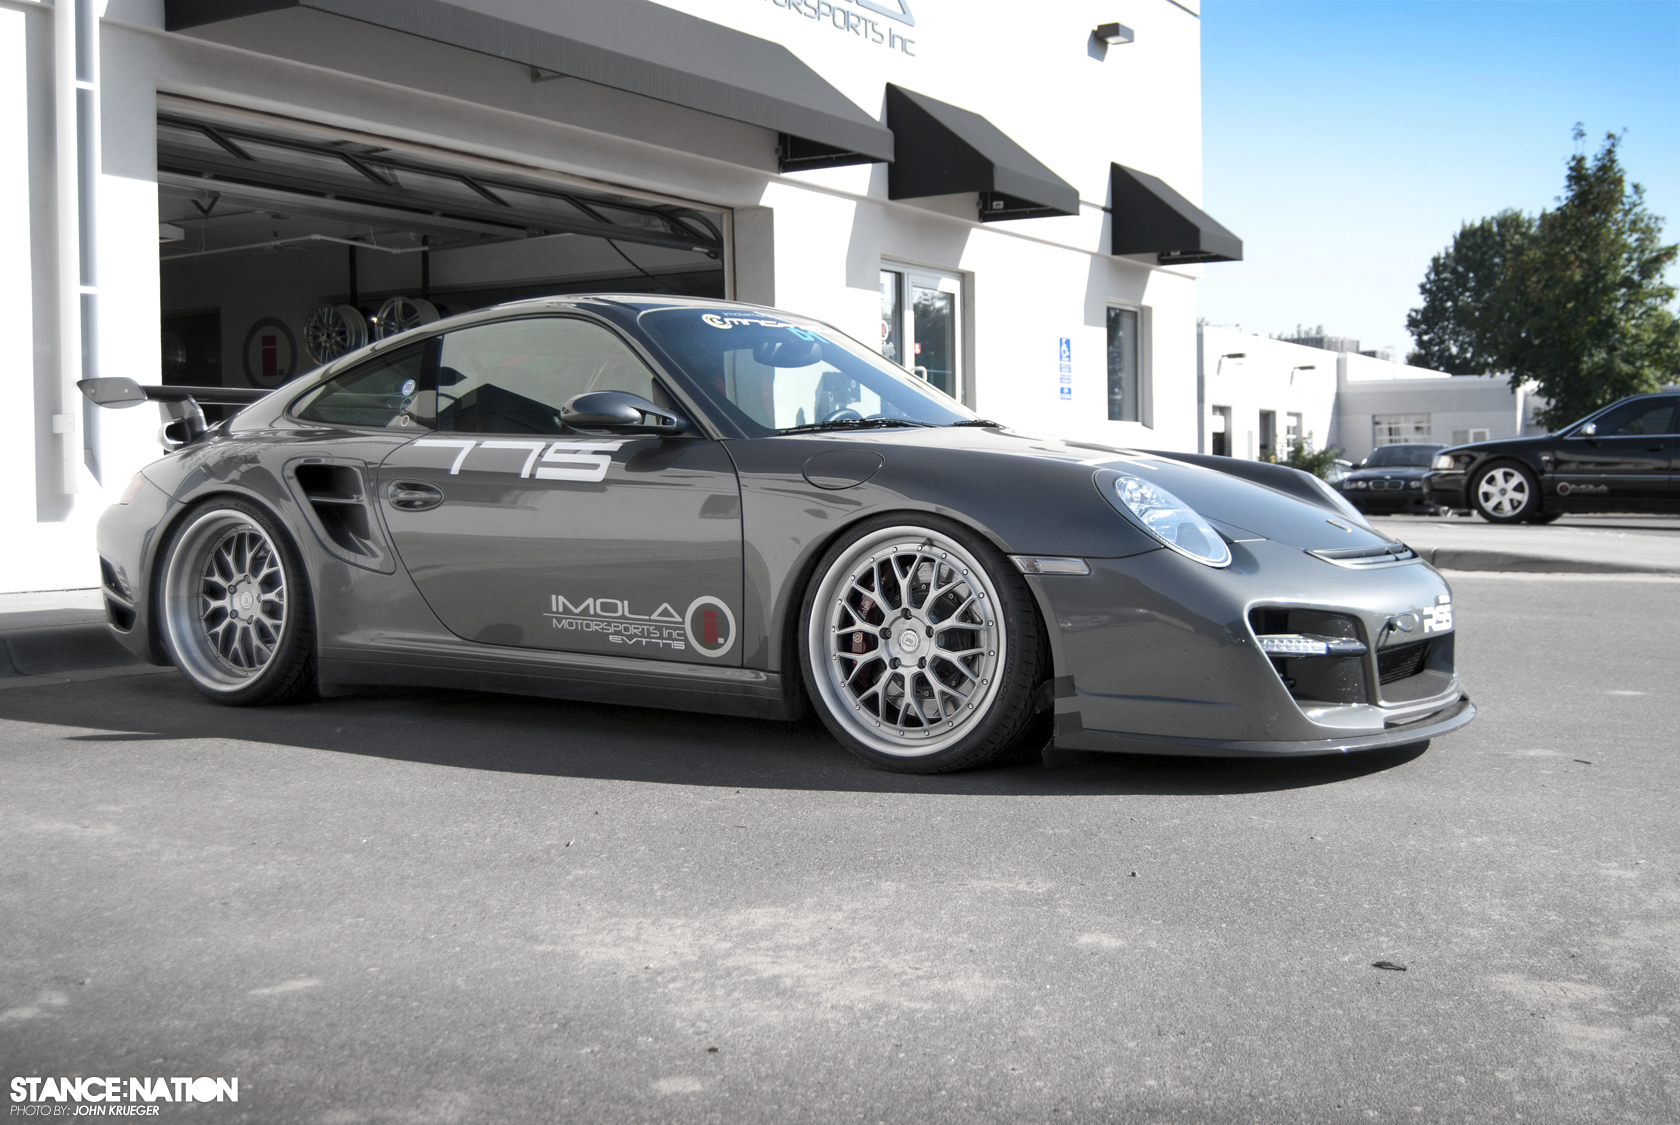 Imola Motorsports Porsche 997 Turbo Stancenation